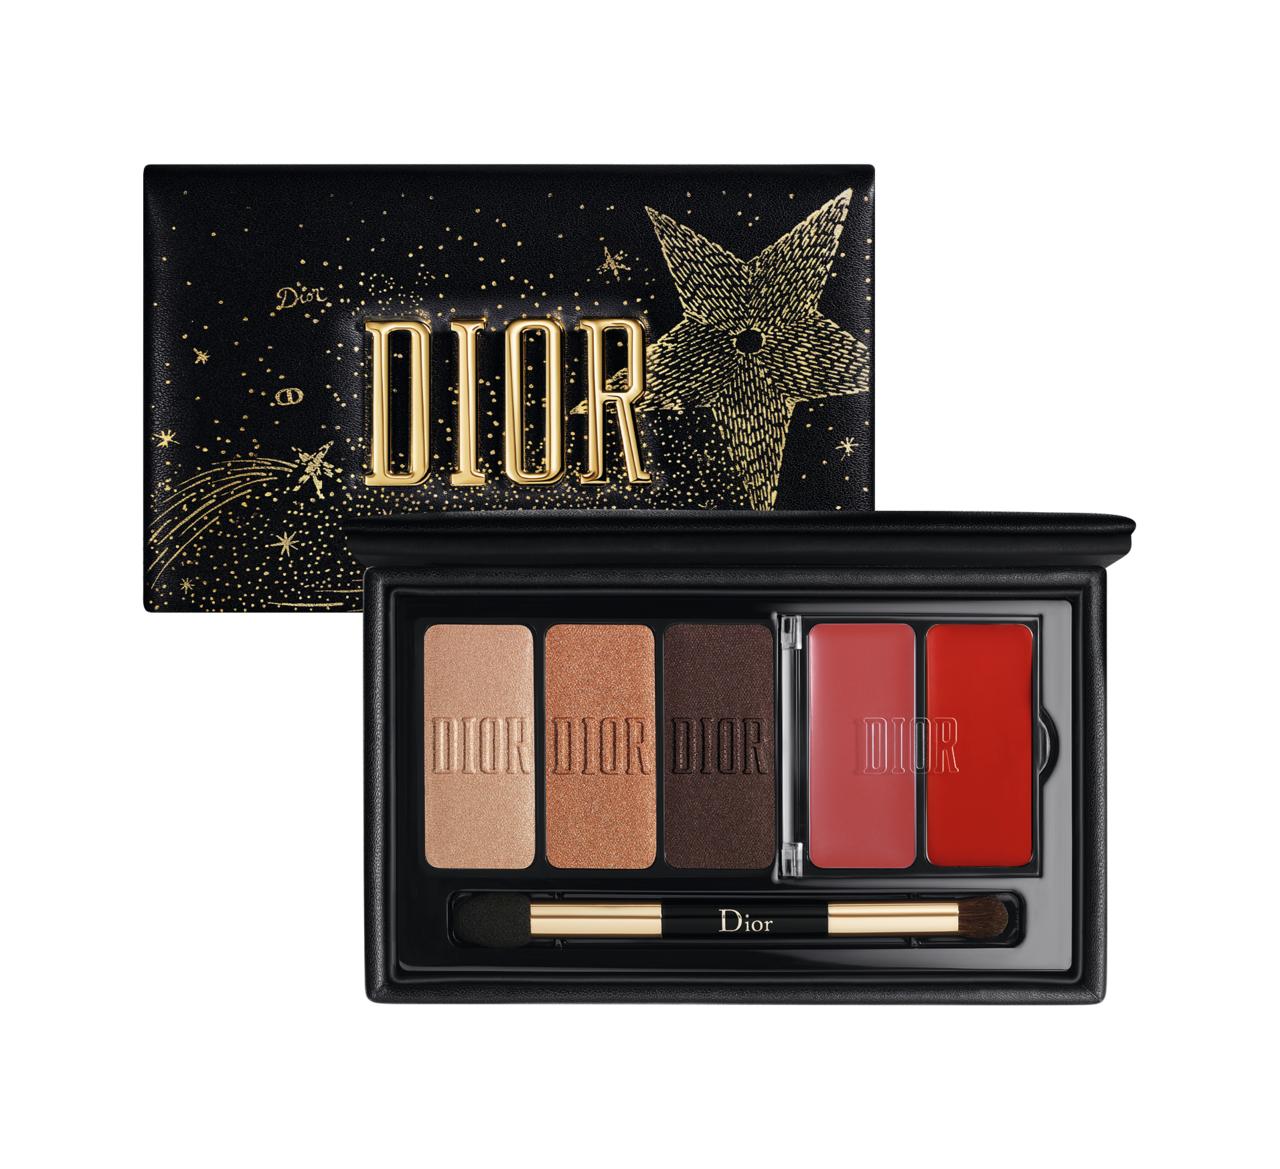 Dior(ディオール)クリスマスコフレ「スパークリング クチュール アイ&リップ パレット」